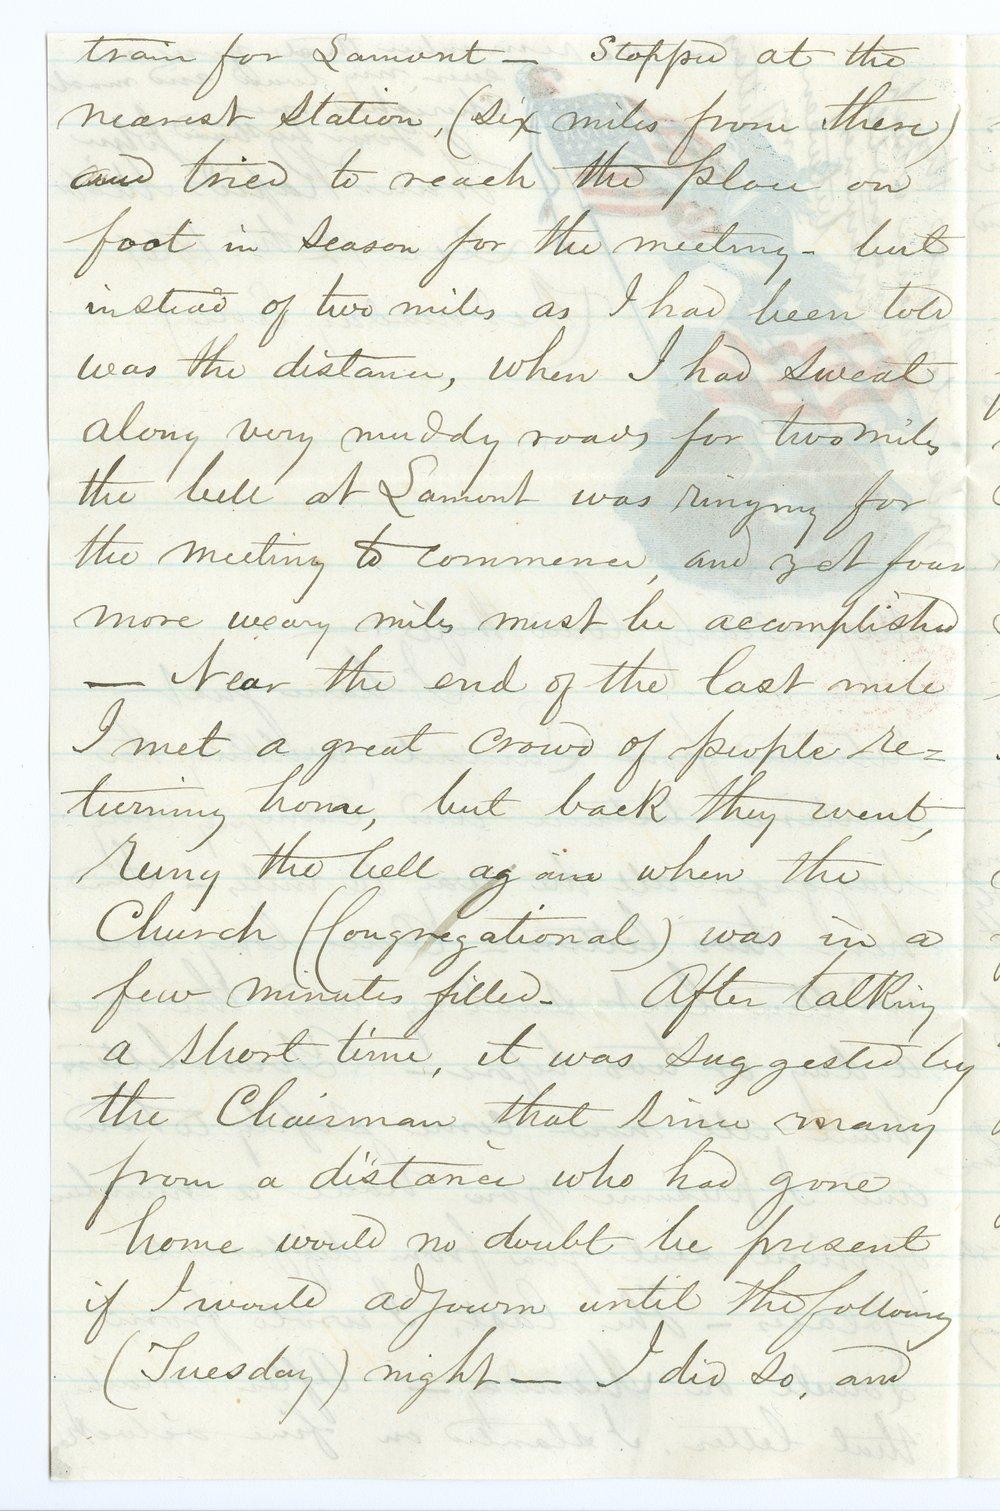 John Brown, Jr. correspondence - 10